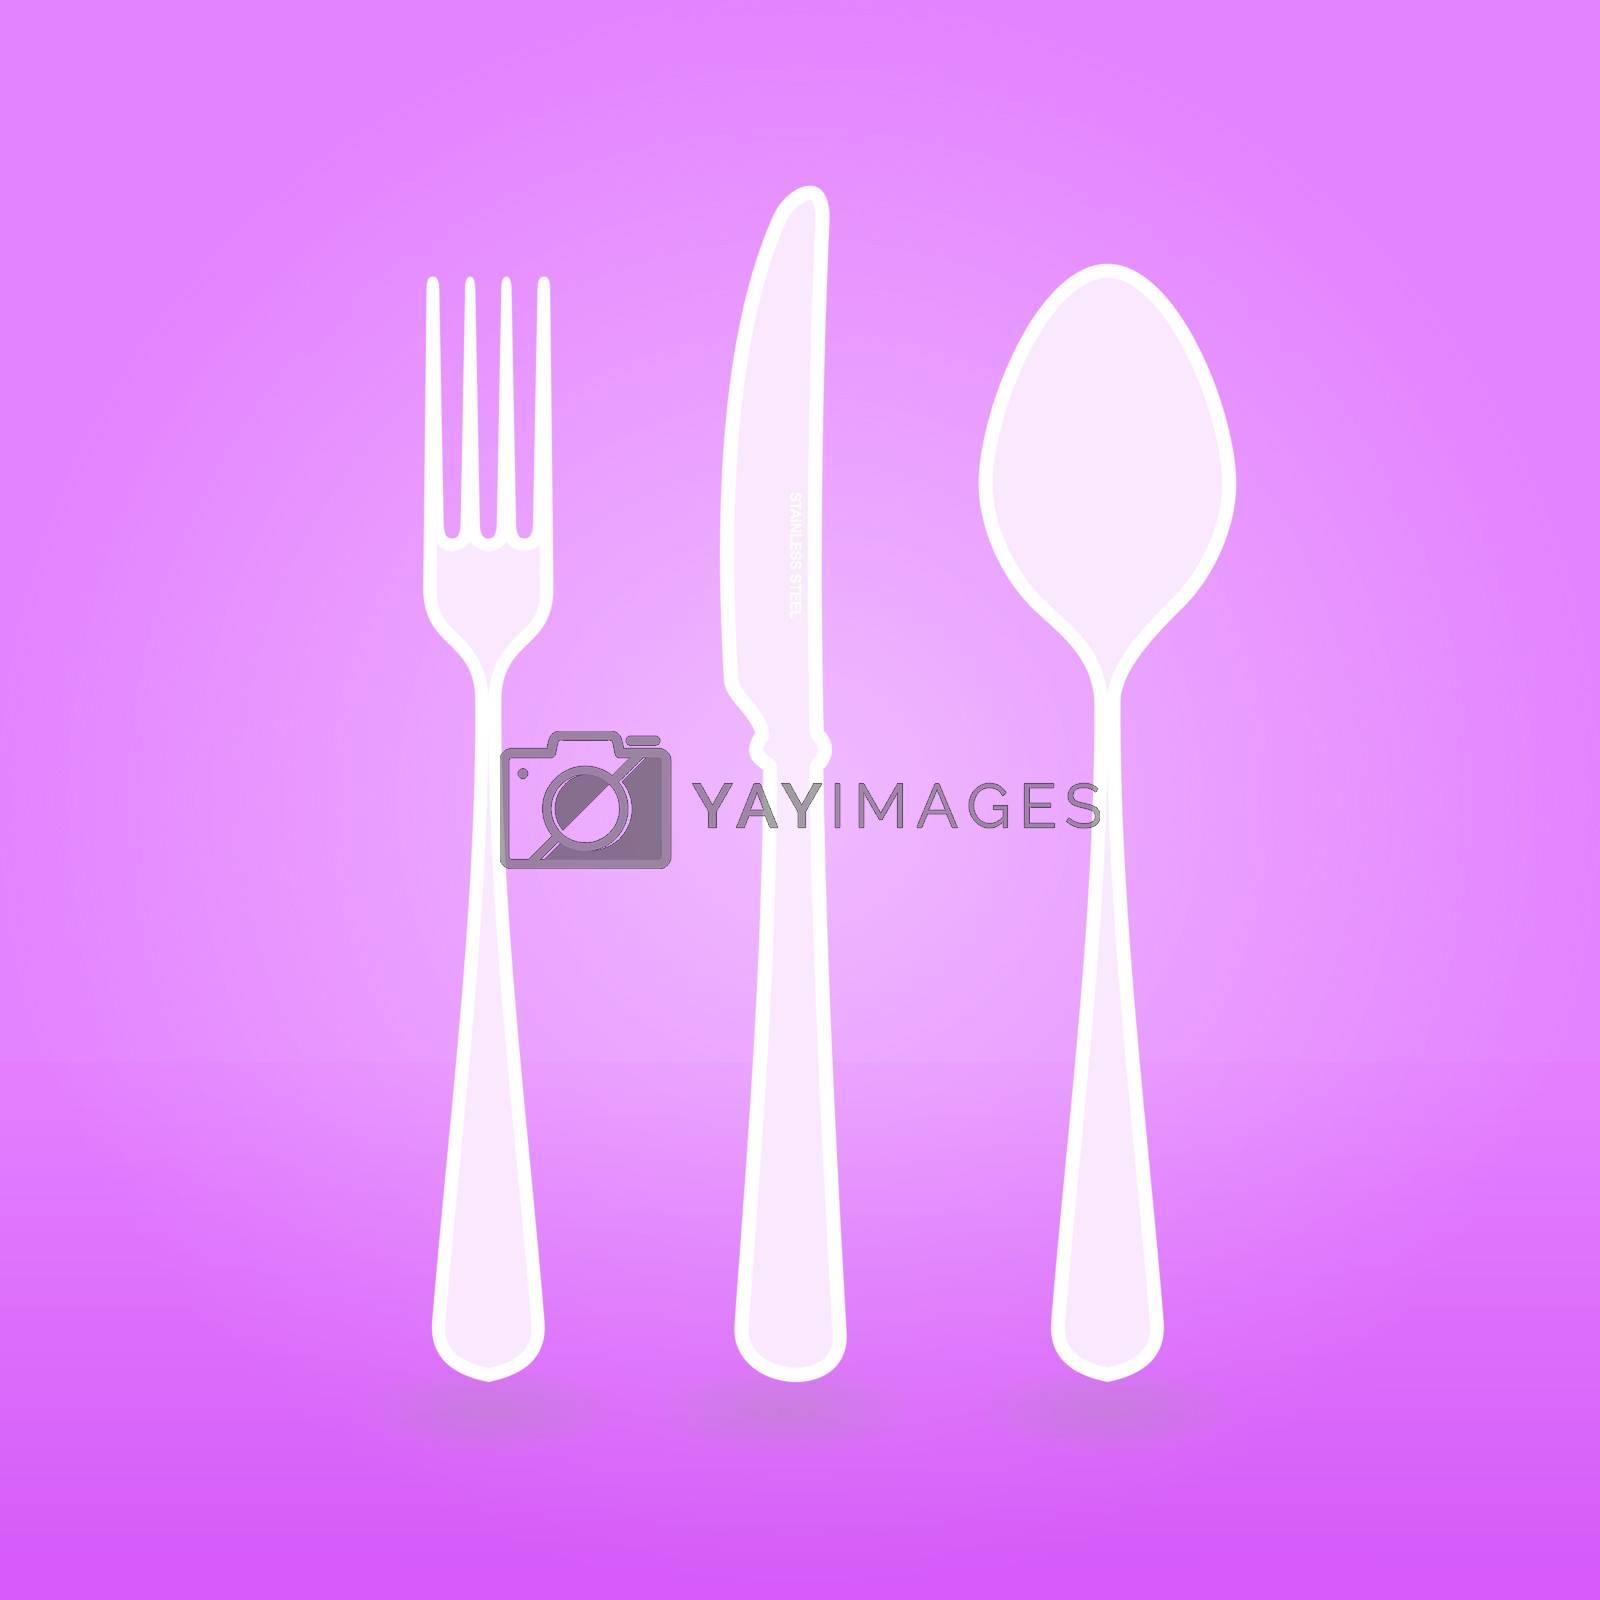 Illustration of Violet Cutlery vector set as design concept or background